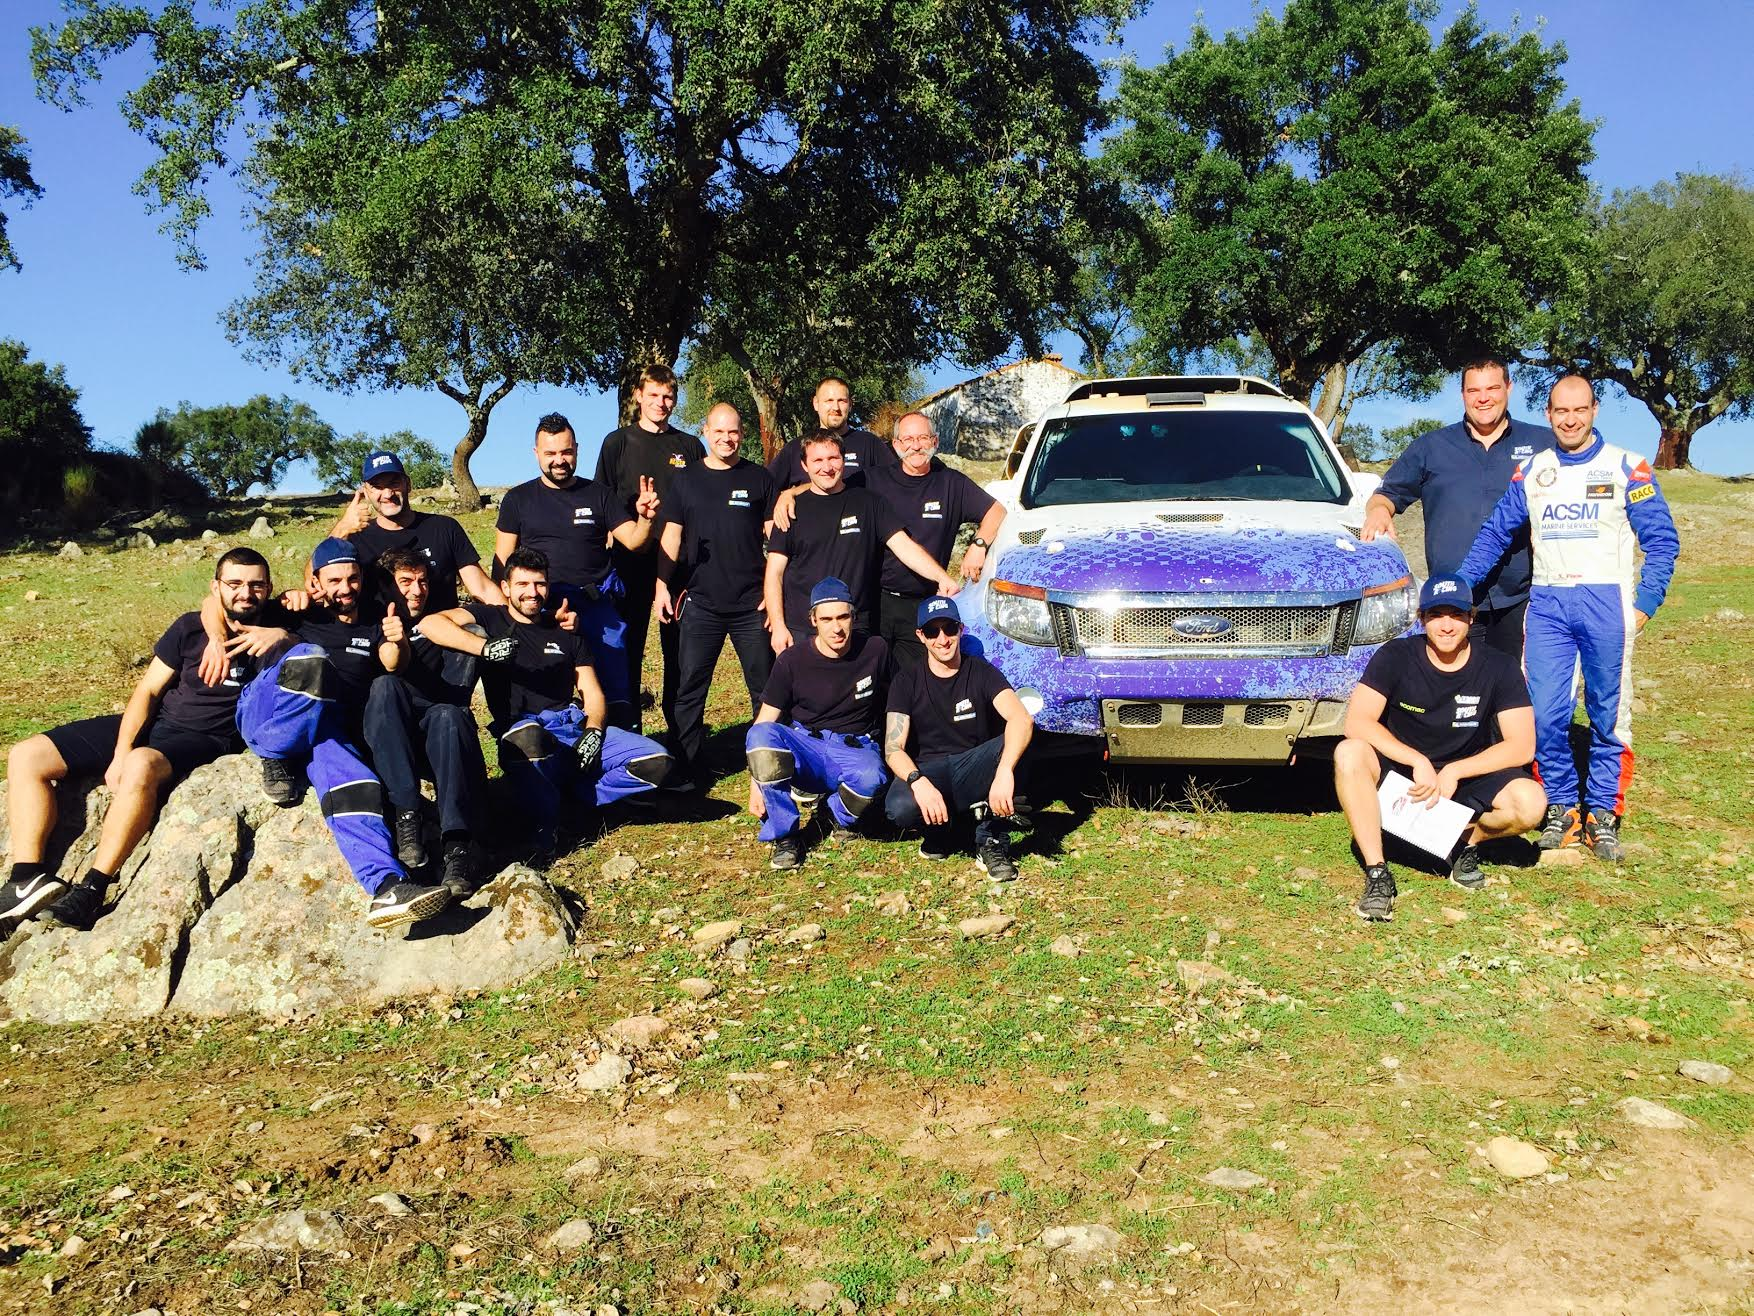 2016 Rallye Raid Dakar Argentina - Bolivia [3-16 Enero] - Página 2 CTDTuDuXIAAyUcJ